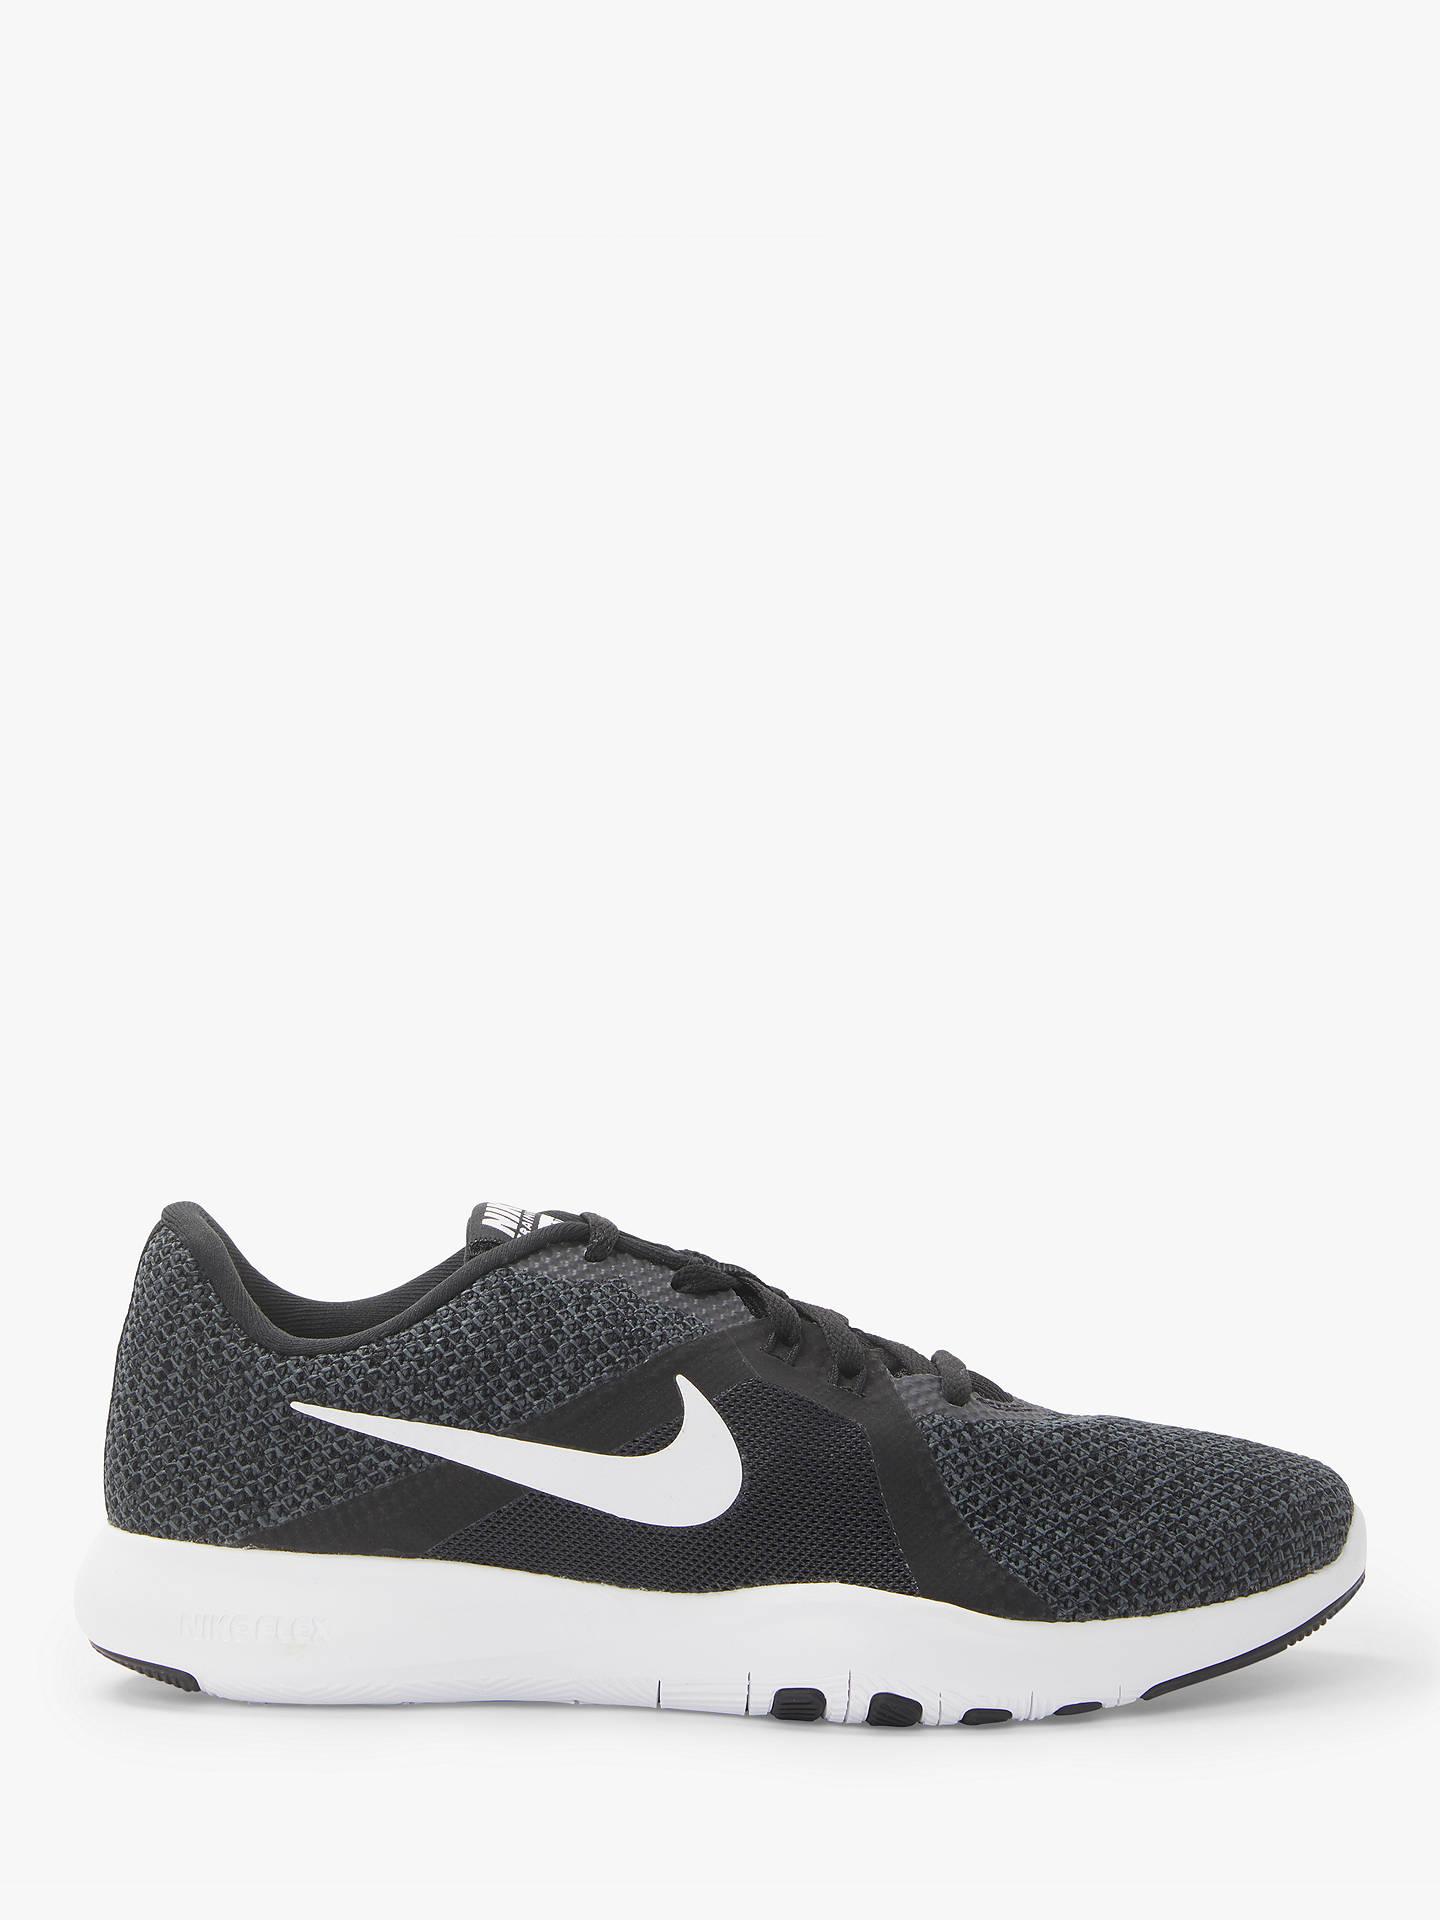 1e4108a0950 Buy Nike Flex TR 8 Women s Training Shoes